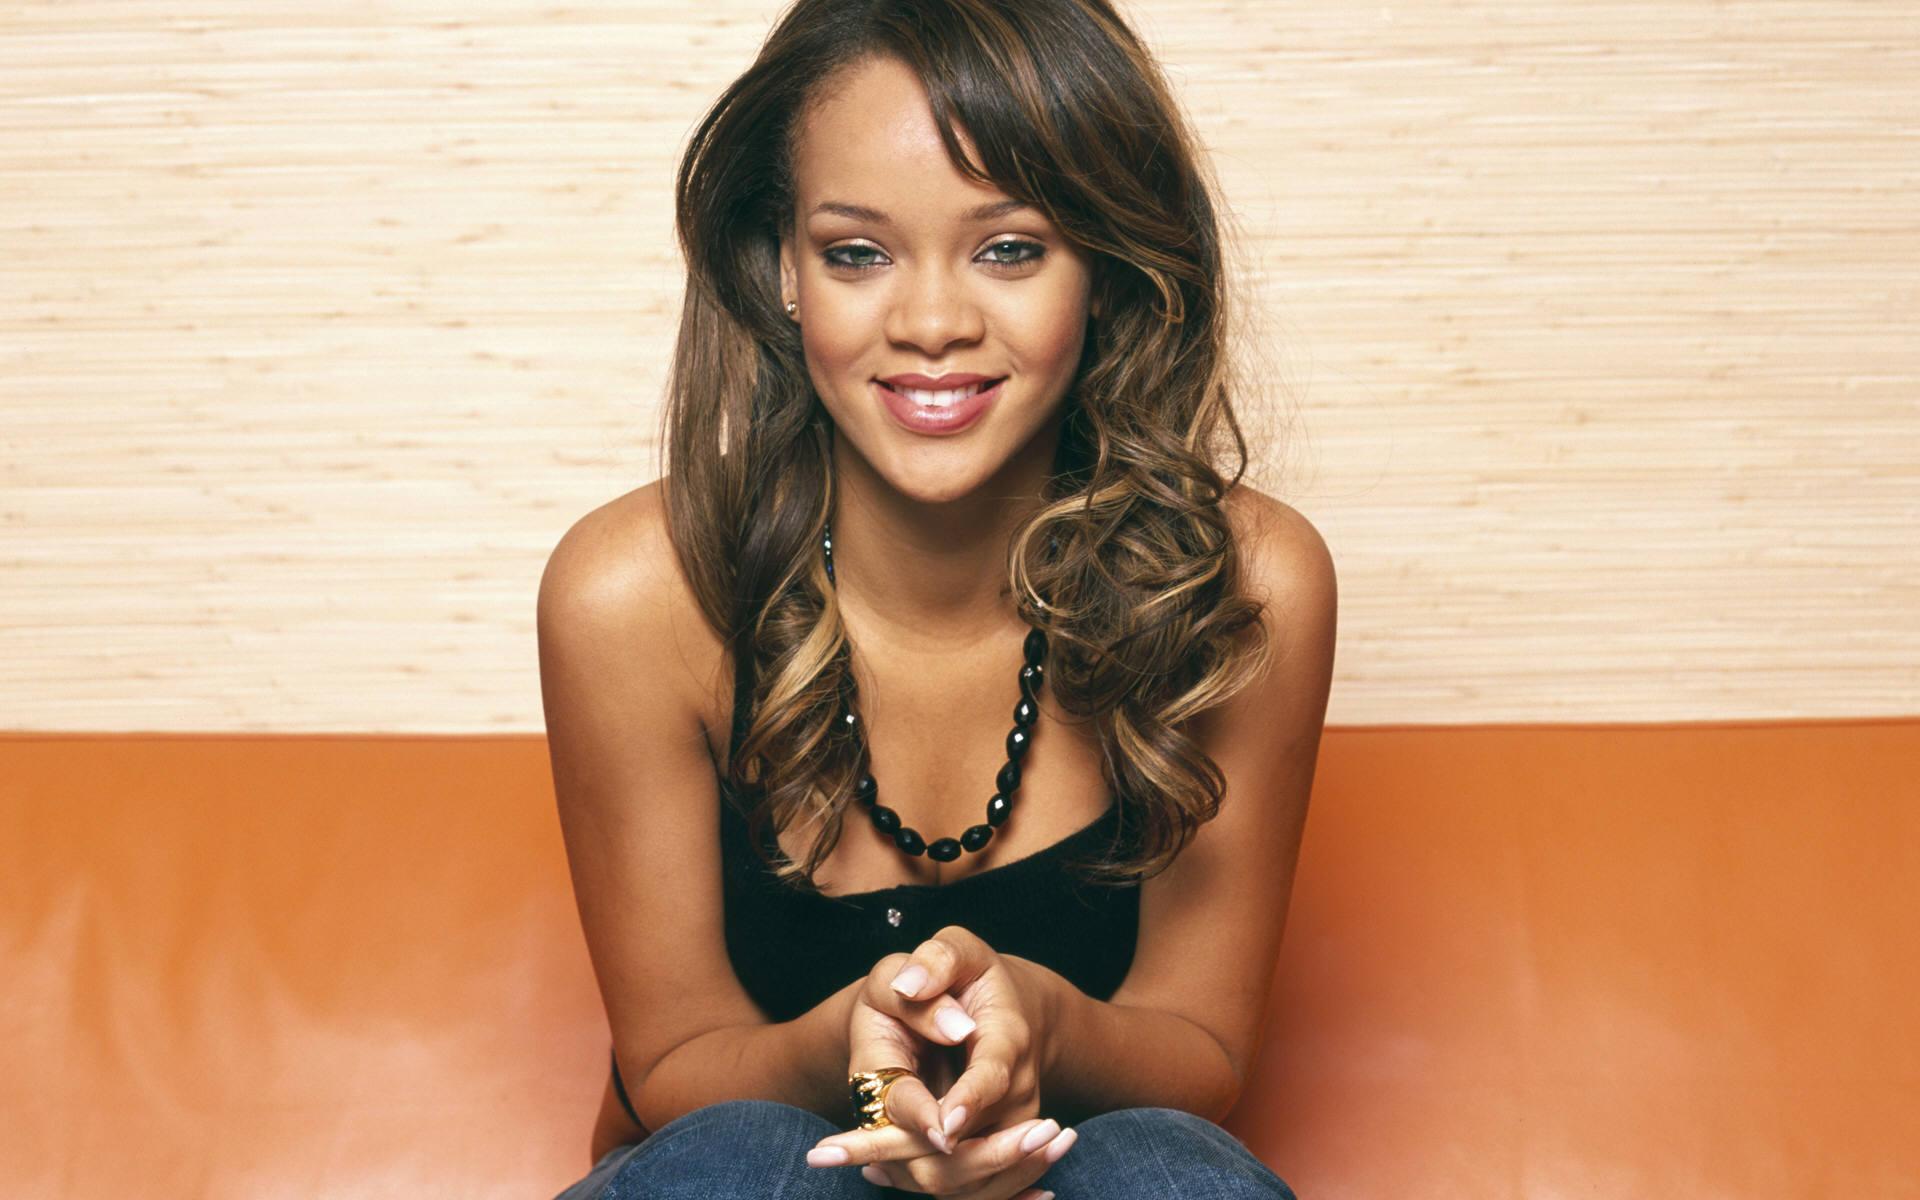 rihanna background photo color 1920x1200 Rihanna